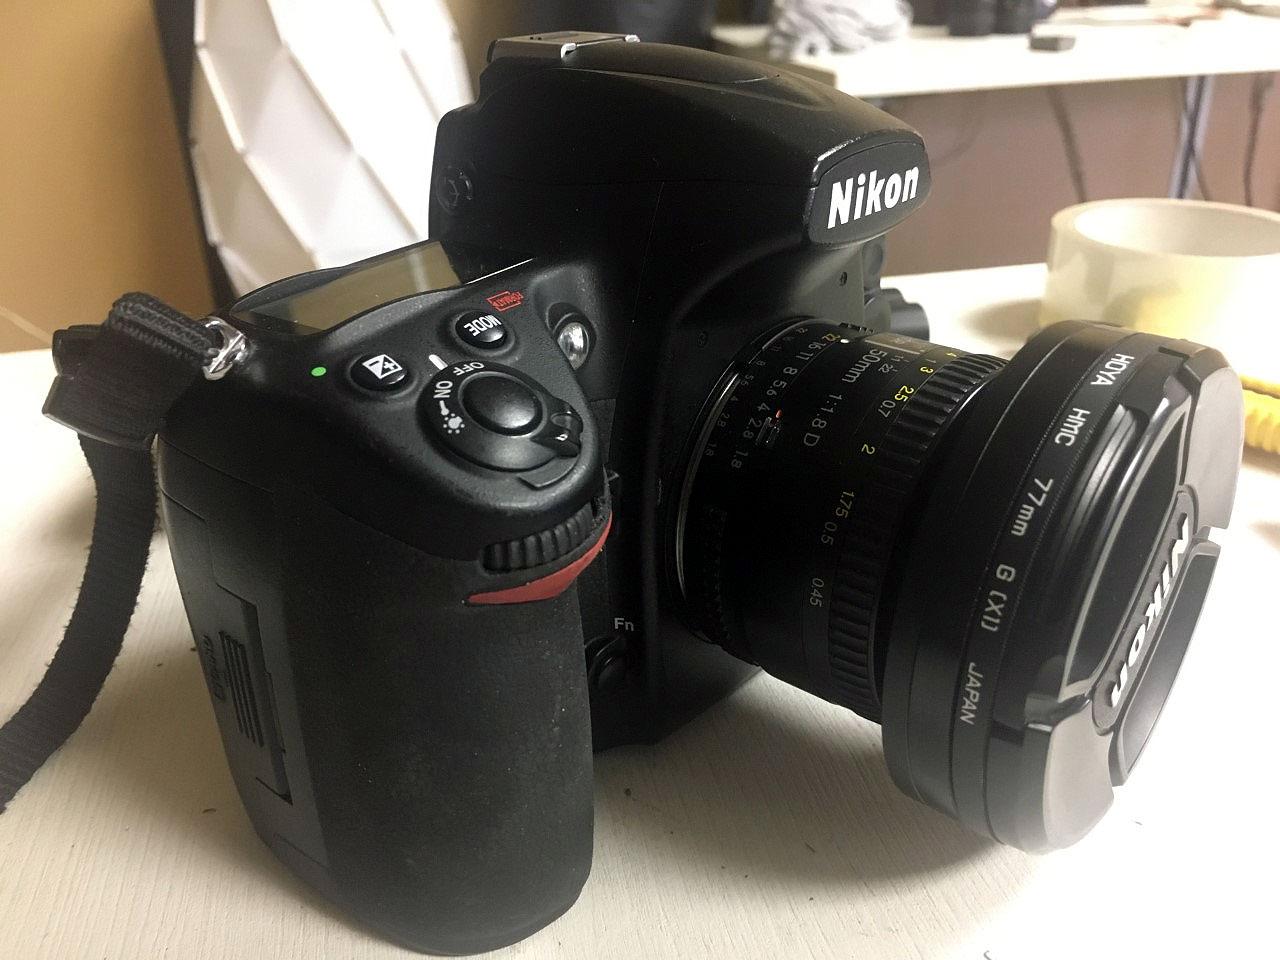 Nikon D700 Infrared